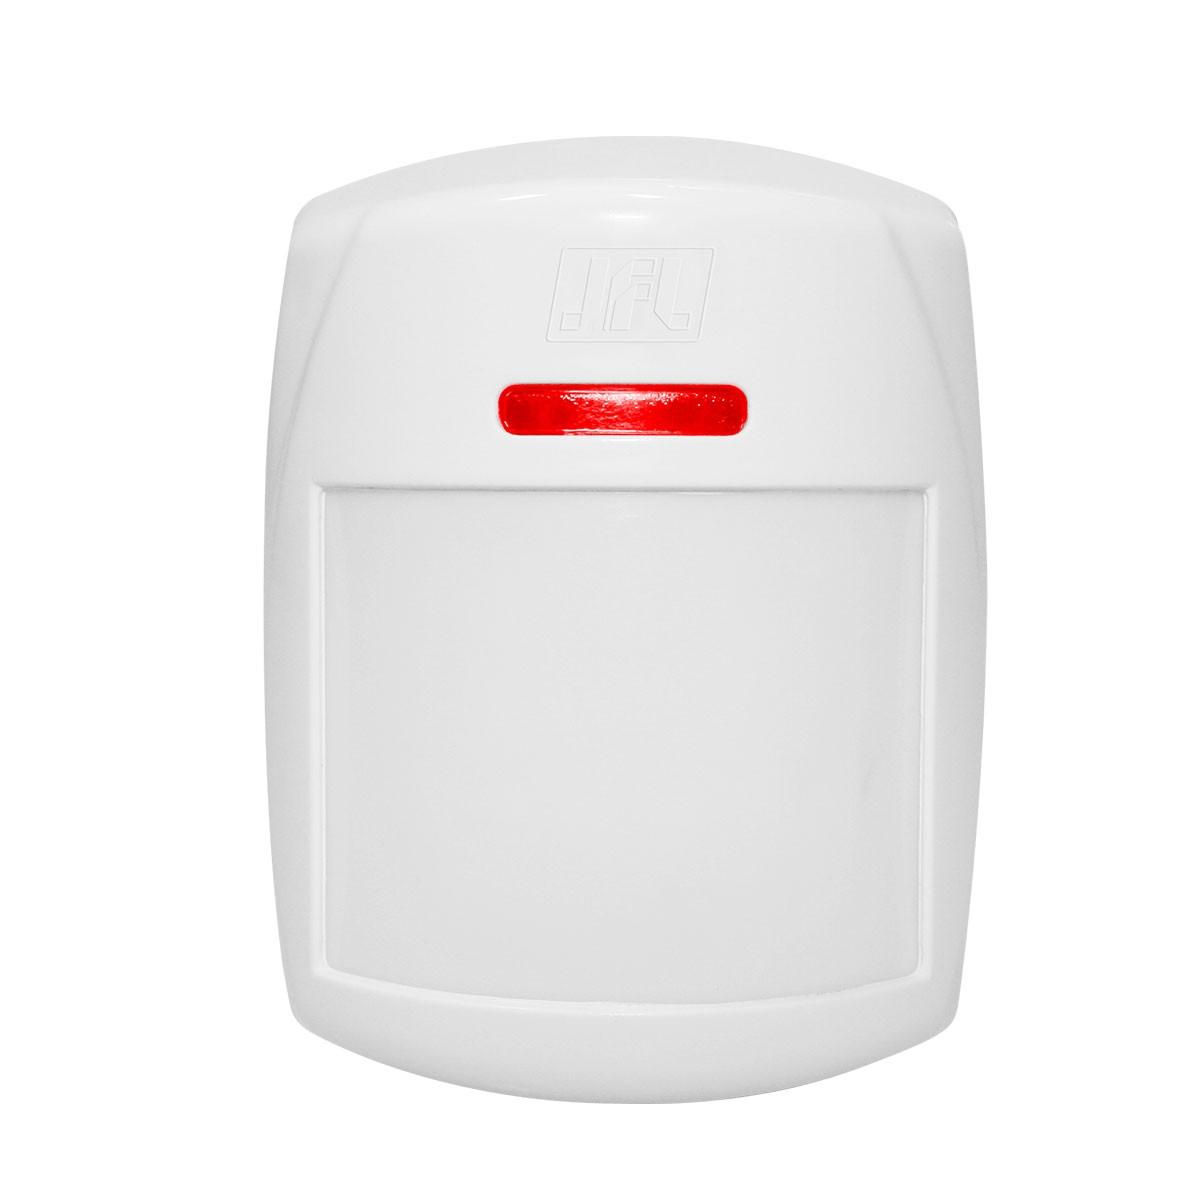 Kit Alarme Monitorado Active 32 Duo + Teclado + Sensores Jfl